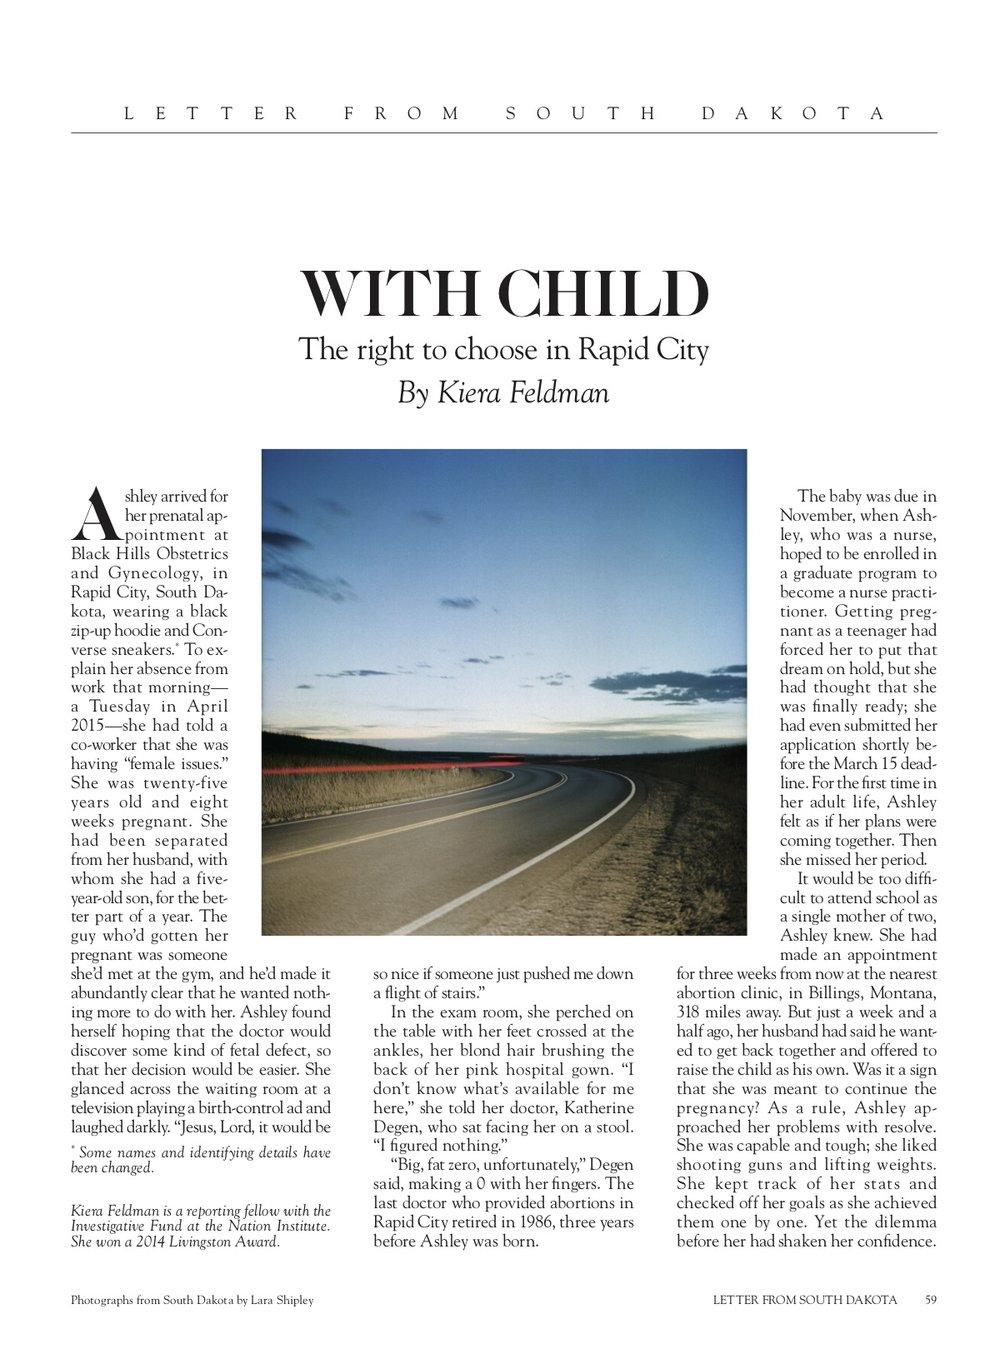 Lara Shipley for Harper's Magazine